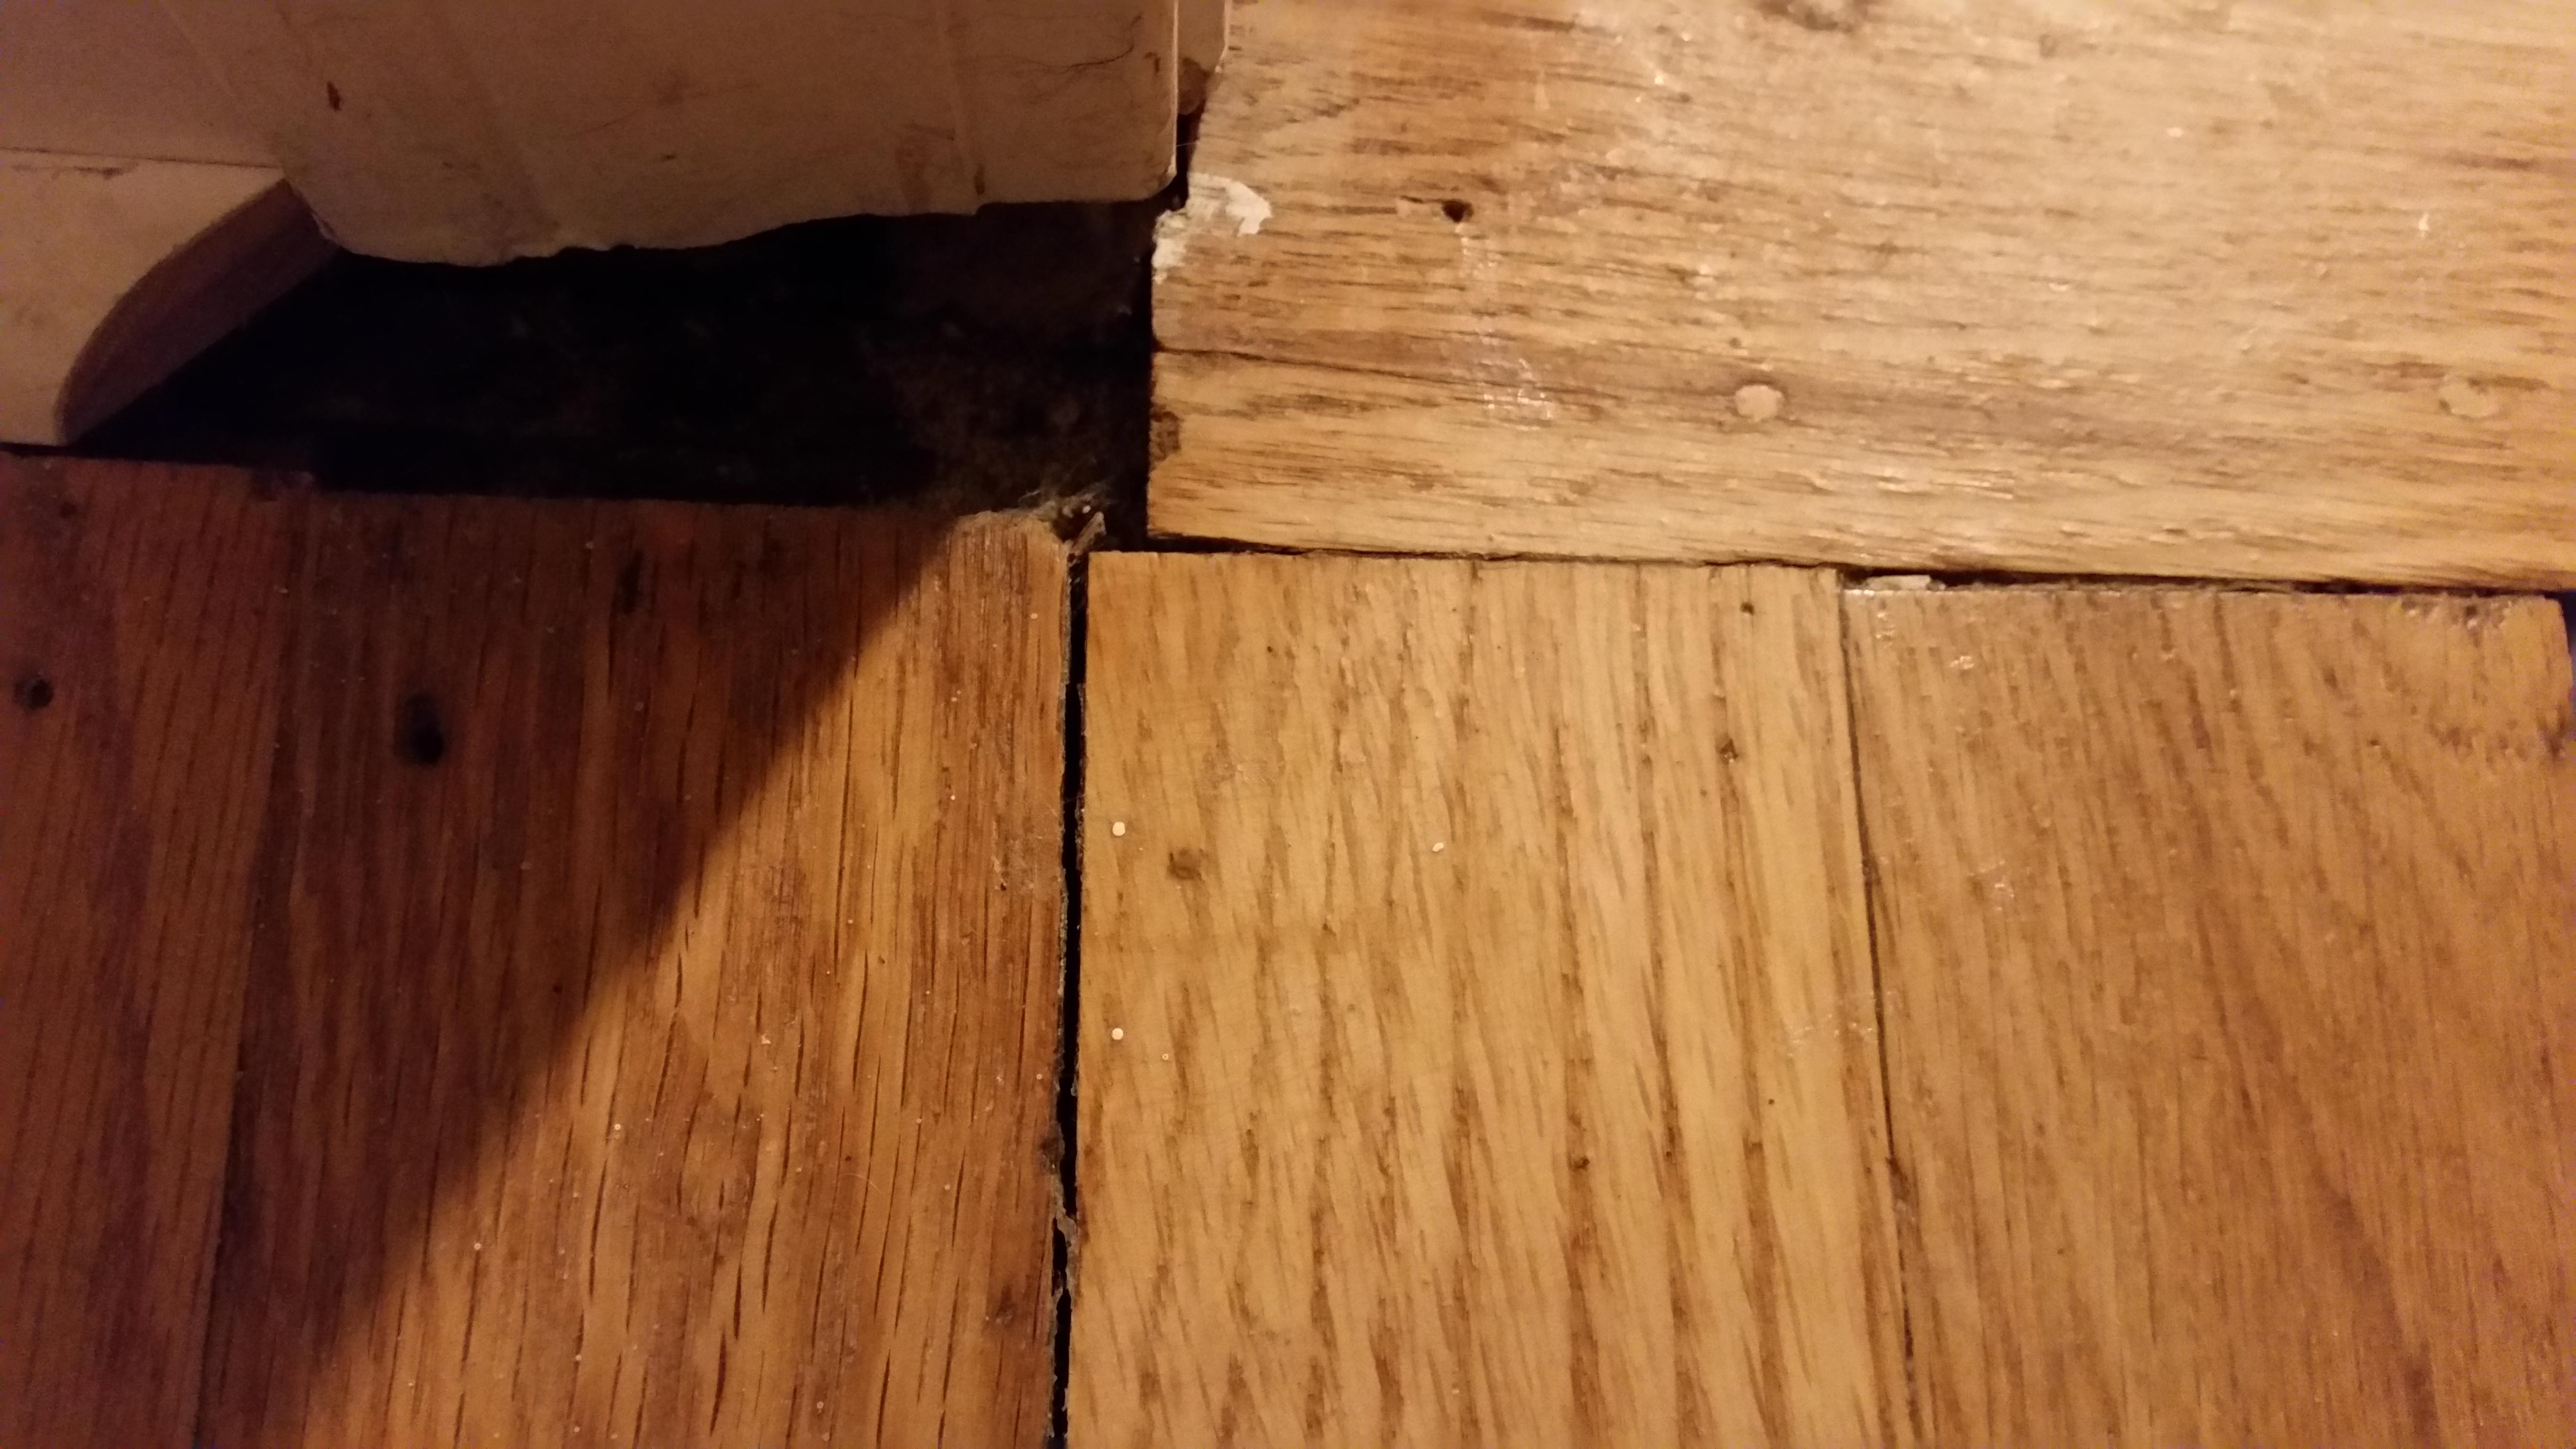 Temporary fix for gap-20180114_194020.jpg